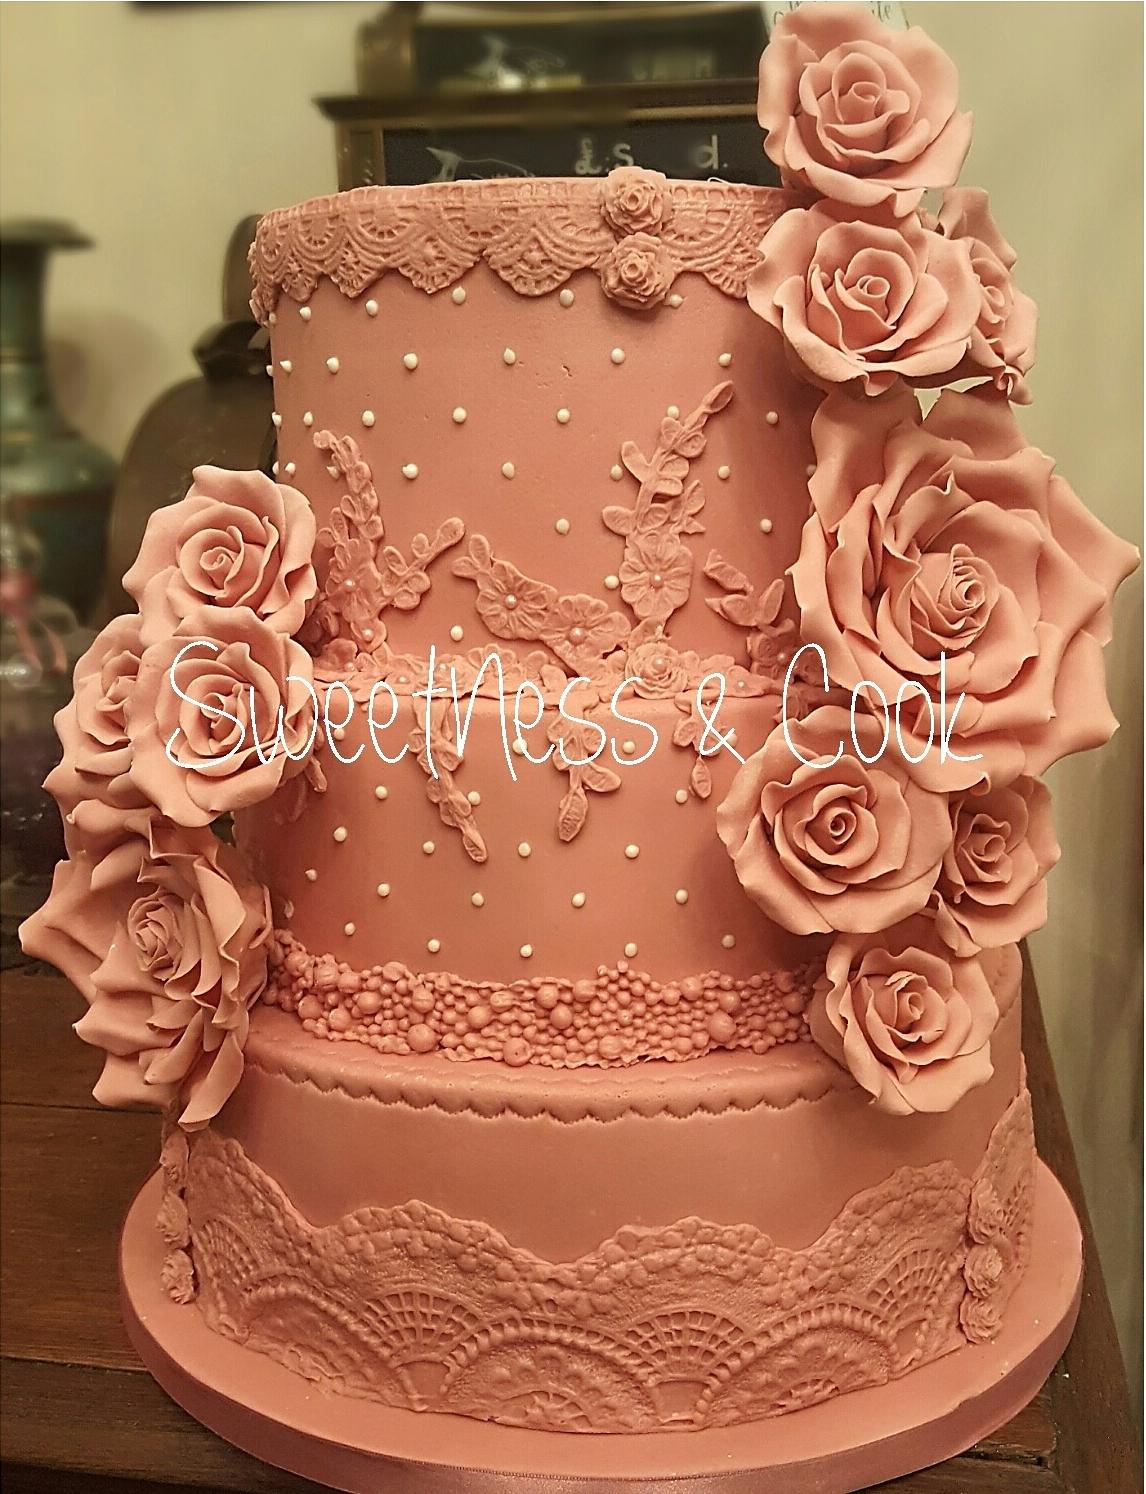 Wedding Cake Shaby chic vieux rose